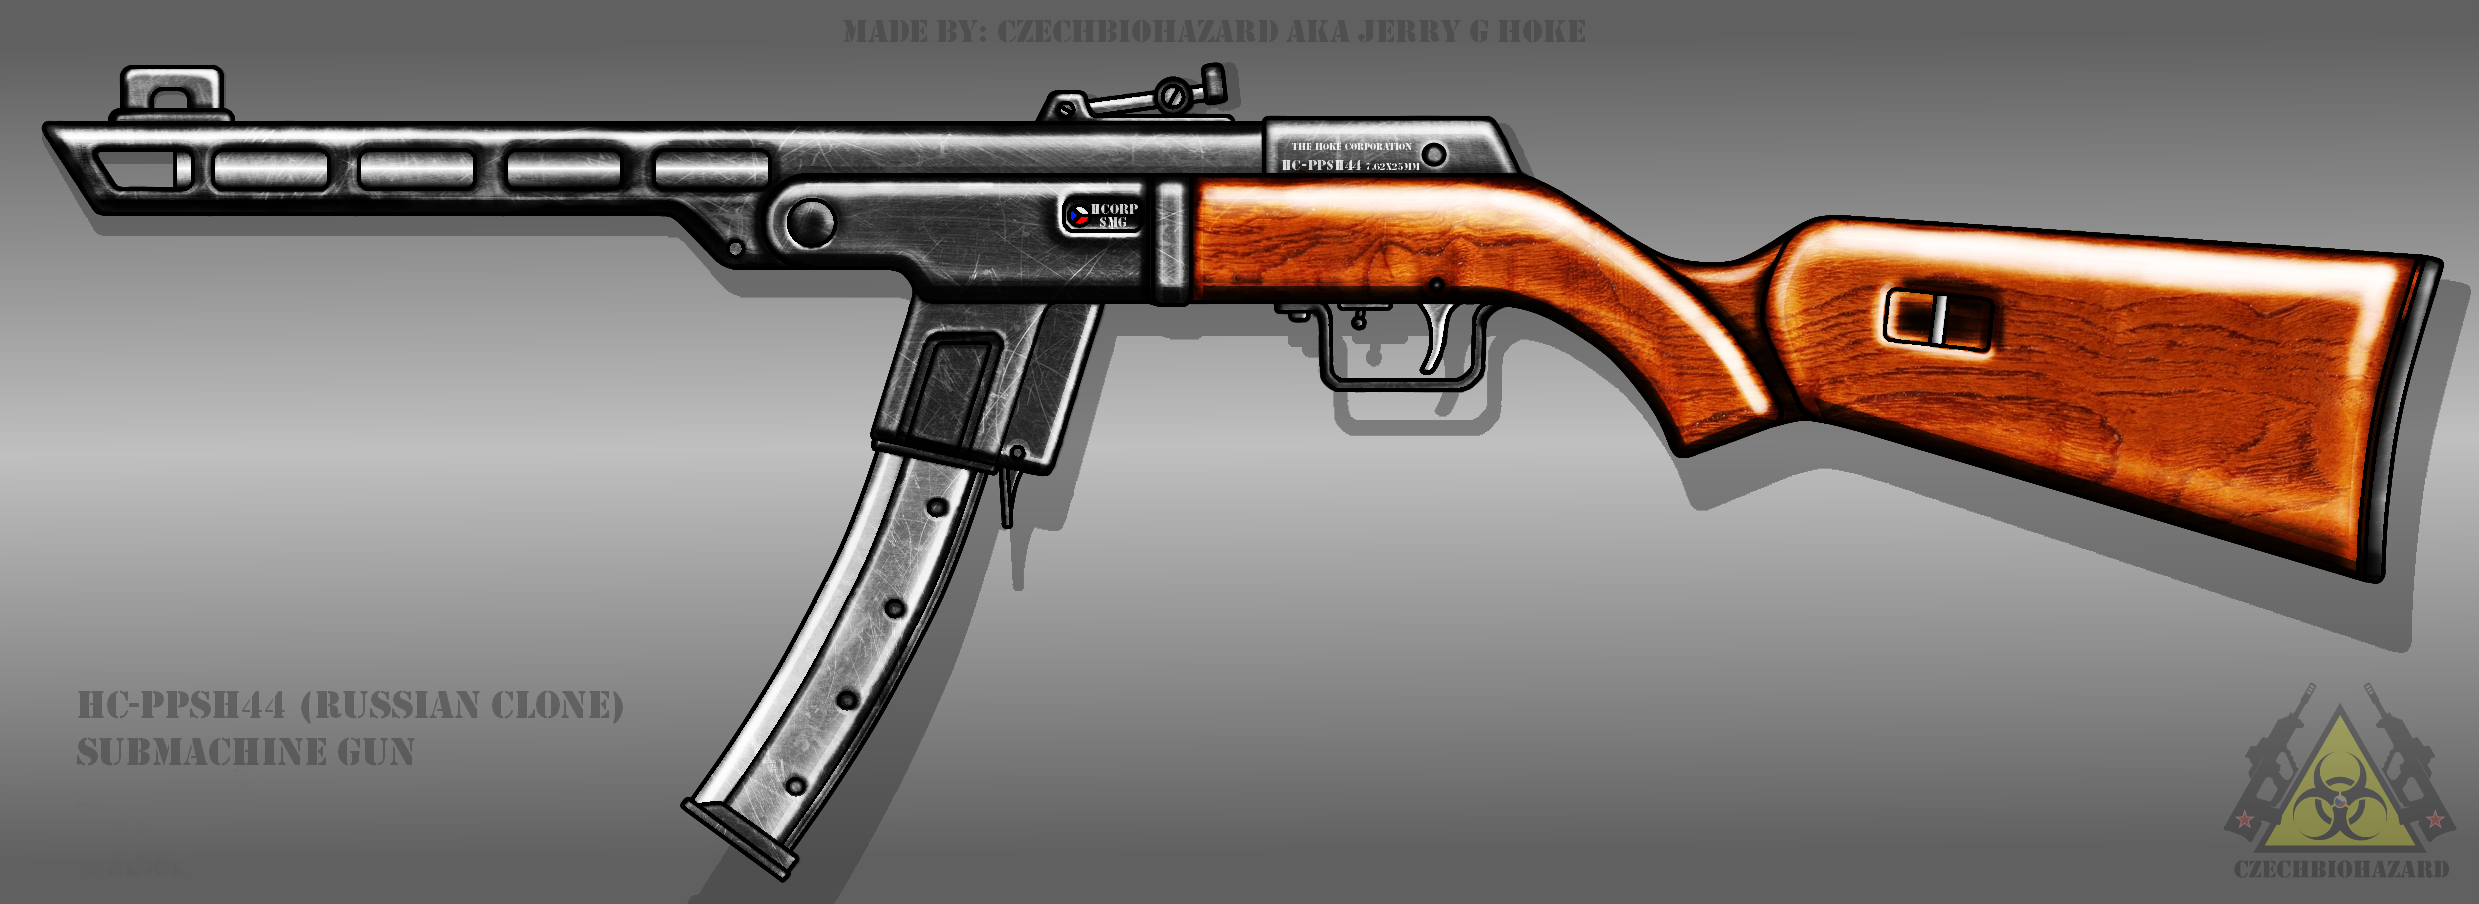 Fictional Firearm: HC-PPSH44 Submachine Gun by CzechBiohazard